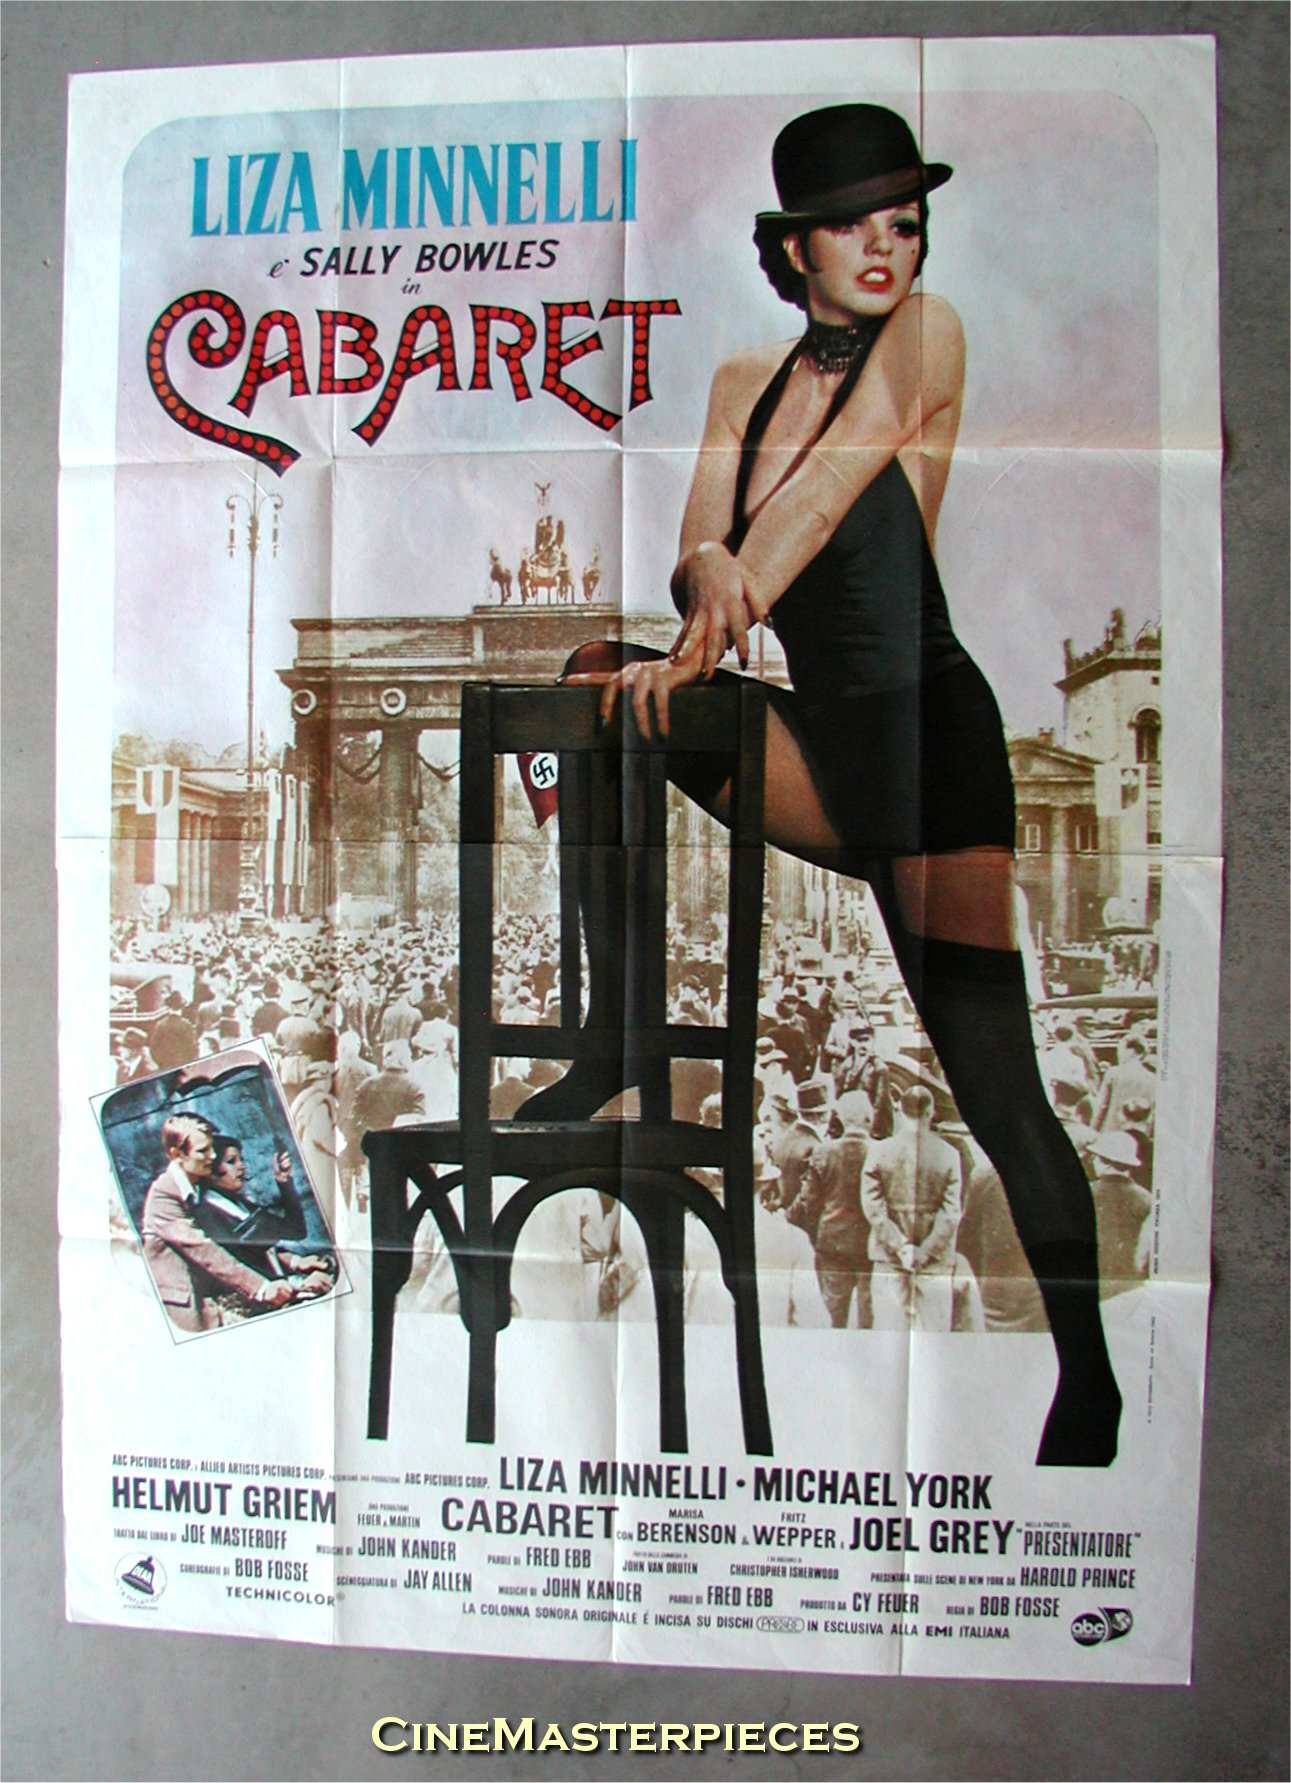 http://www.cinemasterpieces.com/cabaretita4sh.jpg